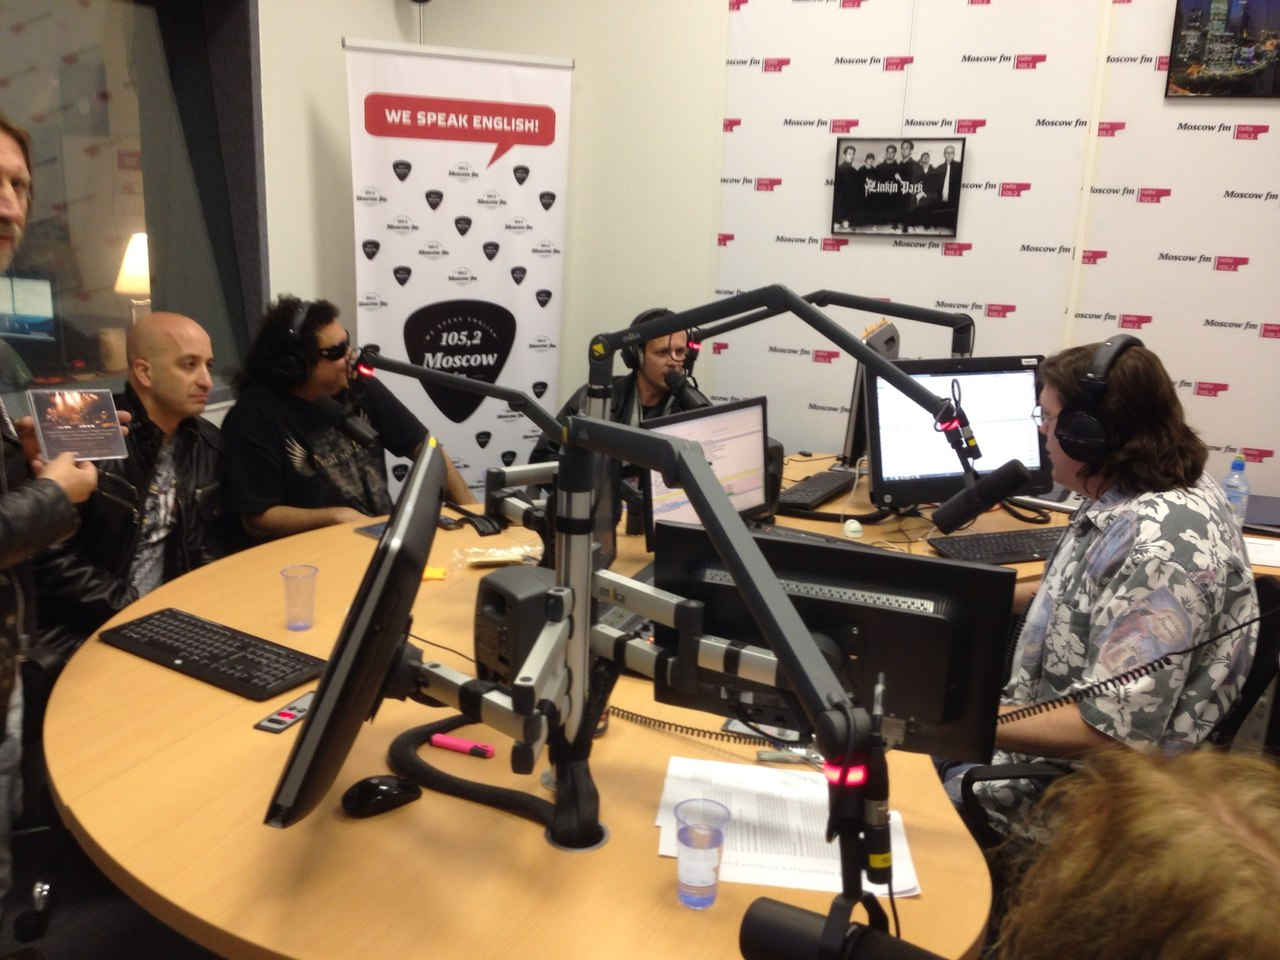 Erotic radio stations